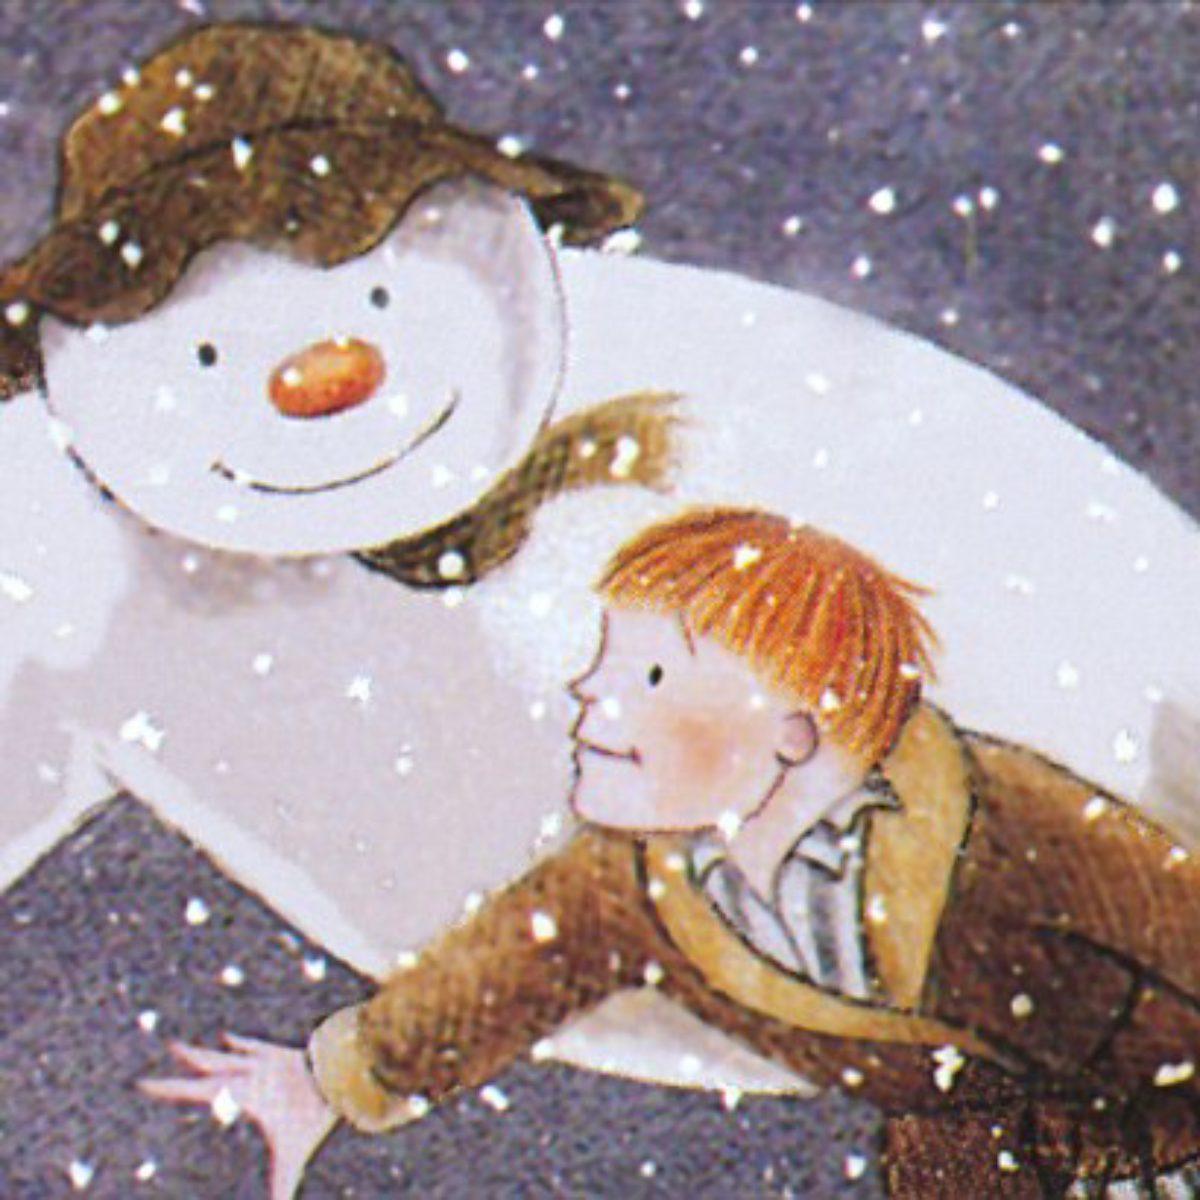 The Shocking Truth Behind Raymond Briggs' The Snowman